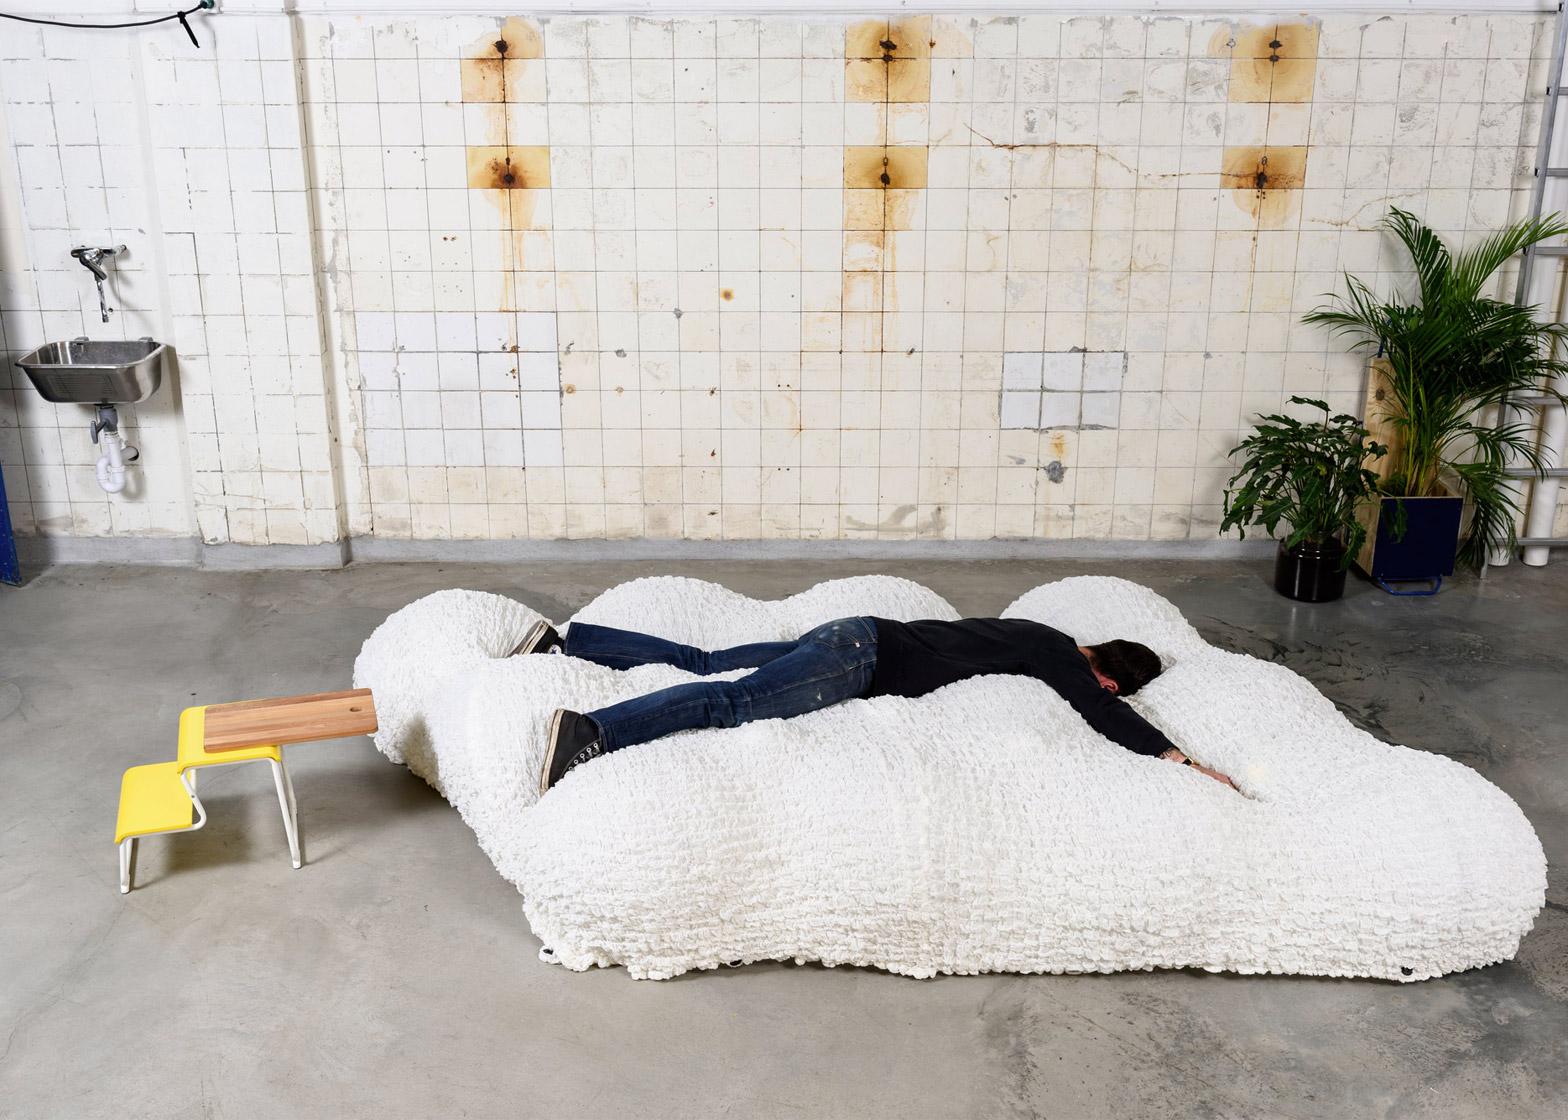 Ikea-Space-10-Innovation-Lab_Alastair-Philip-Wiper_dezeen_1568_1